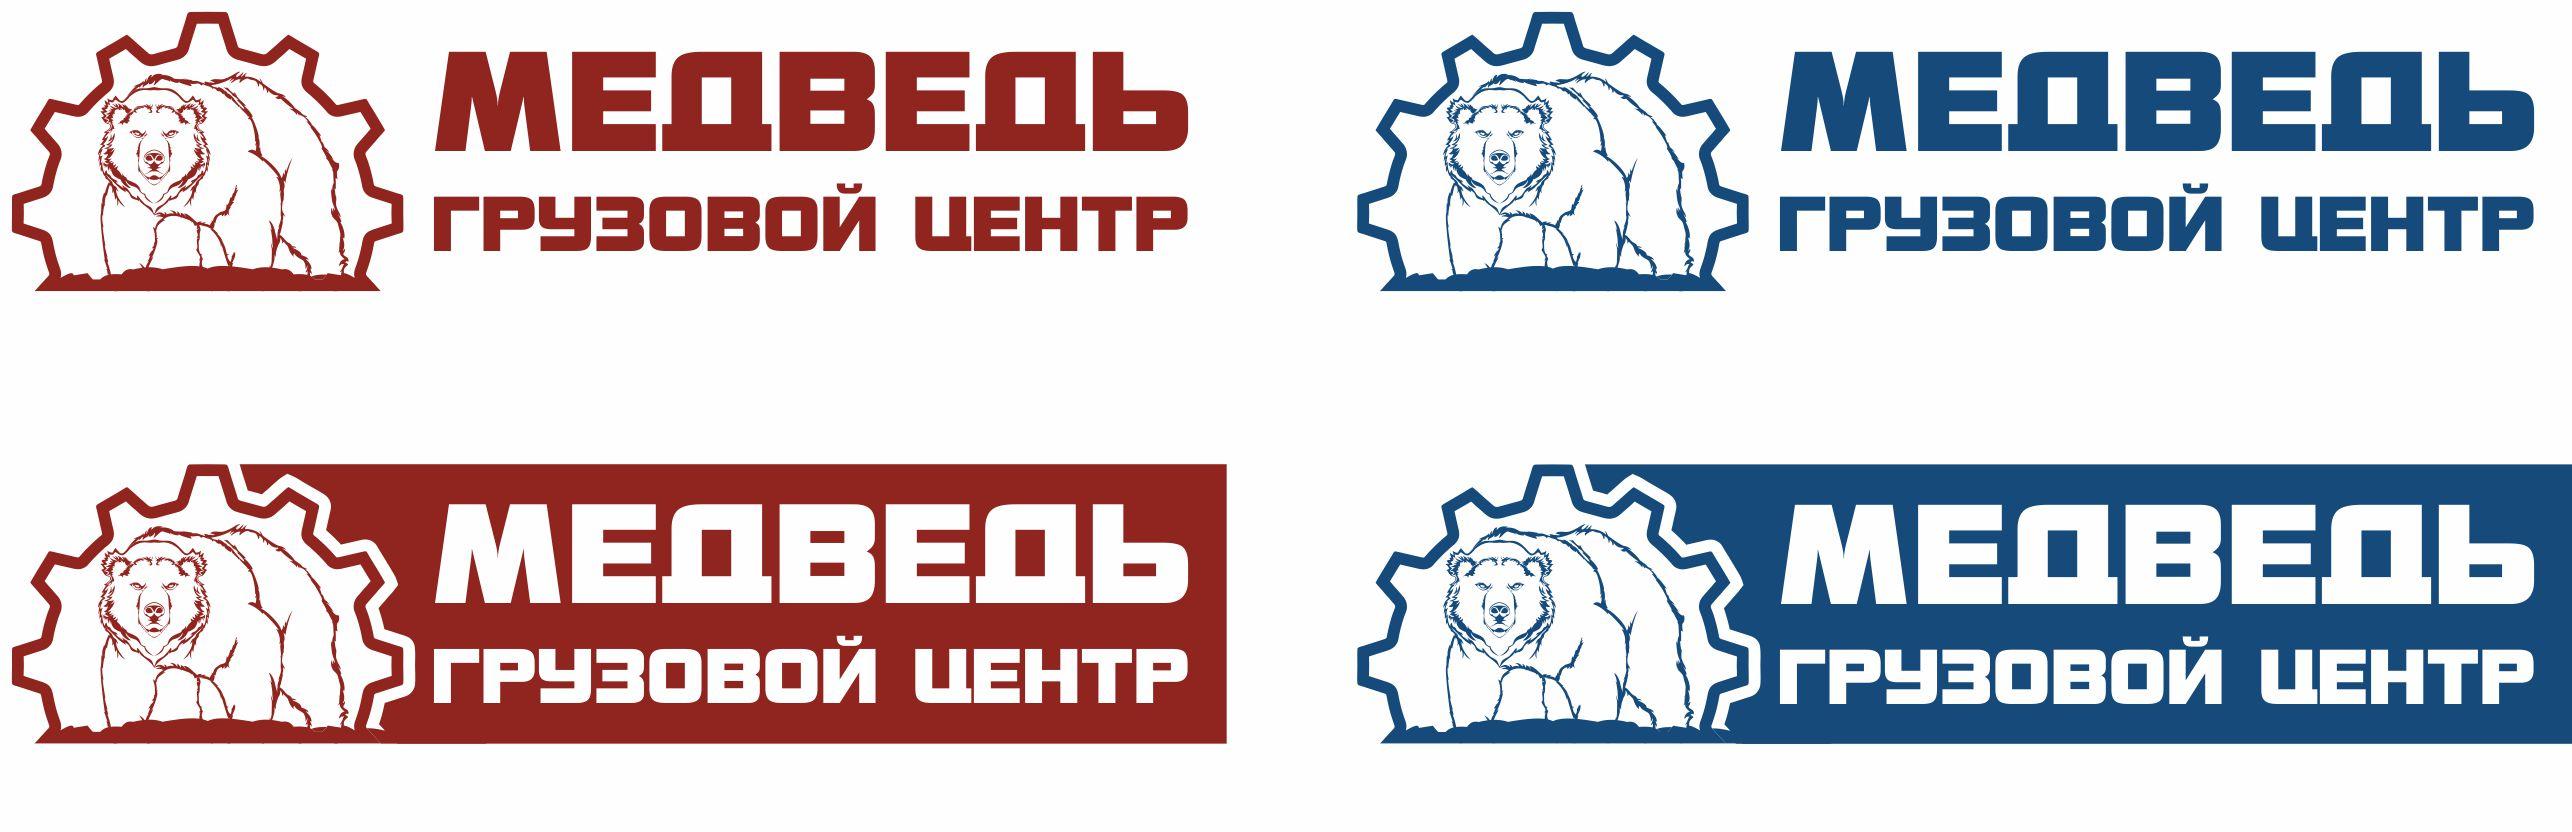 Разработка логотипа фото f_9315abe09e8a3fcd.jpg